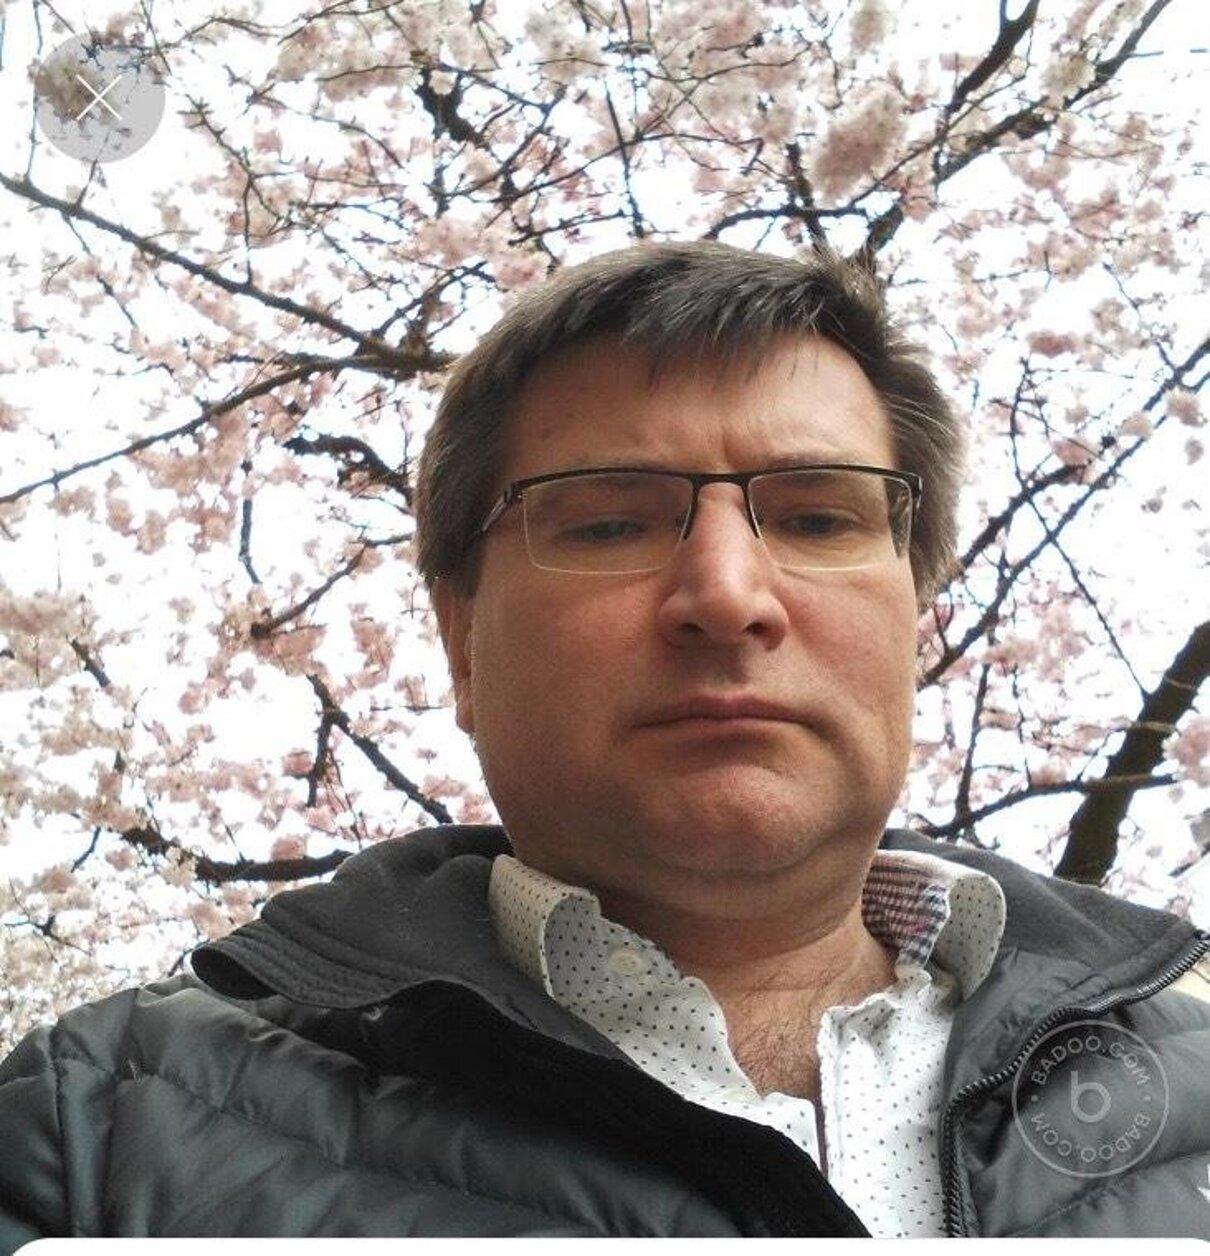 Жалоба-отзыв: Писанец Александр Петрович - Аферист, Вор.  Фото №1